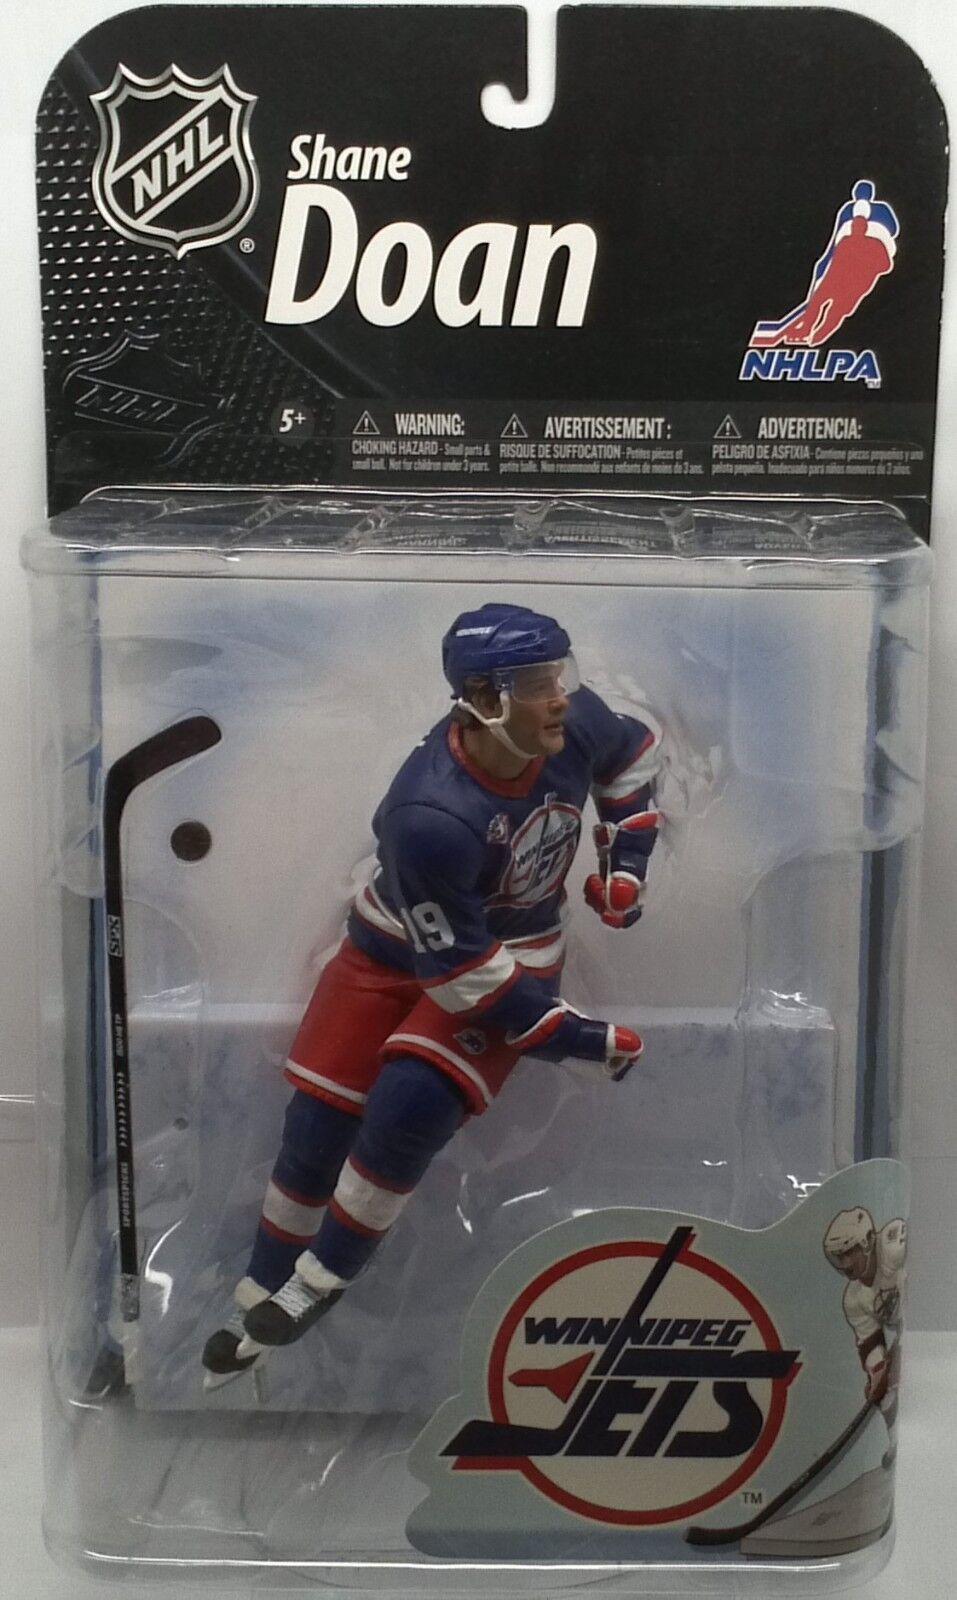 McFarlane Toys NHL SERIES 22 SHANE DOAN DOAN DOAN WINNIPEG blueE VARIATION  216 1996 439b0b